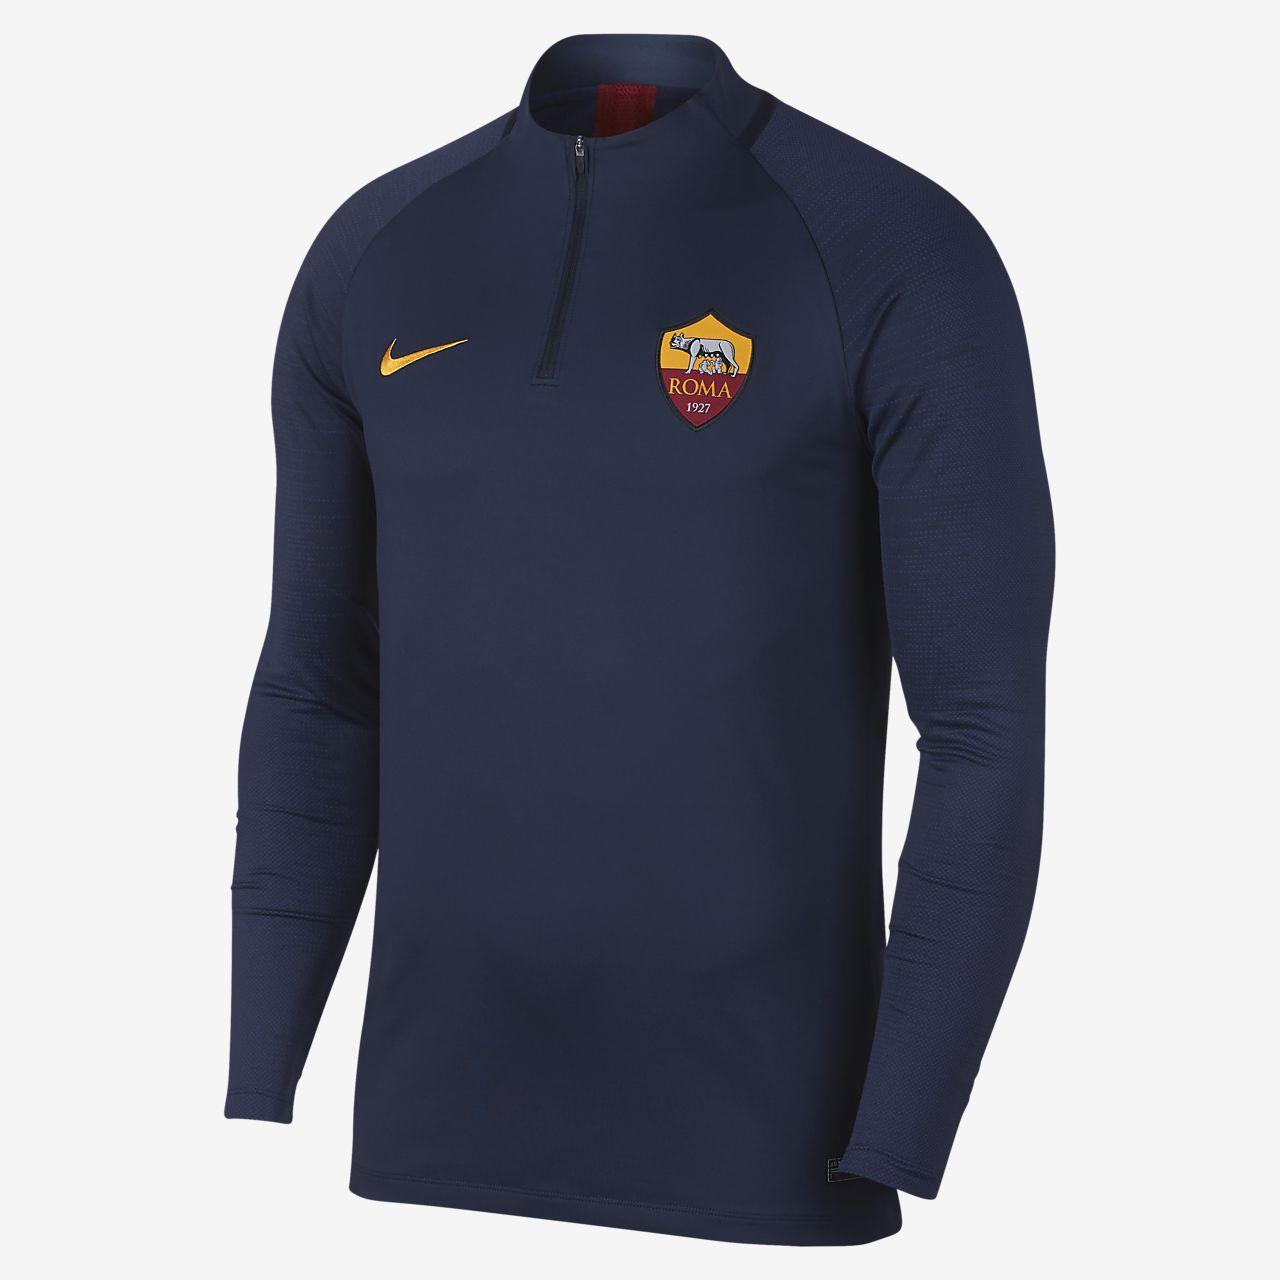 Nike Dri-FIT A.S. Roma Strike Men's Football Drill Top